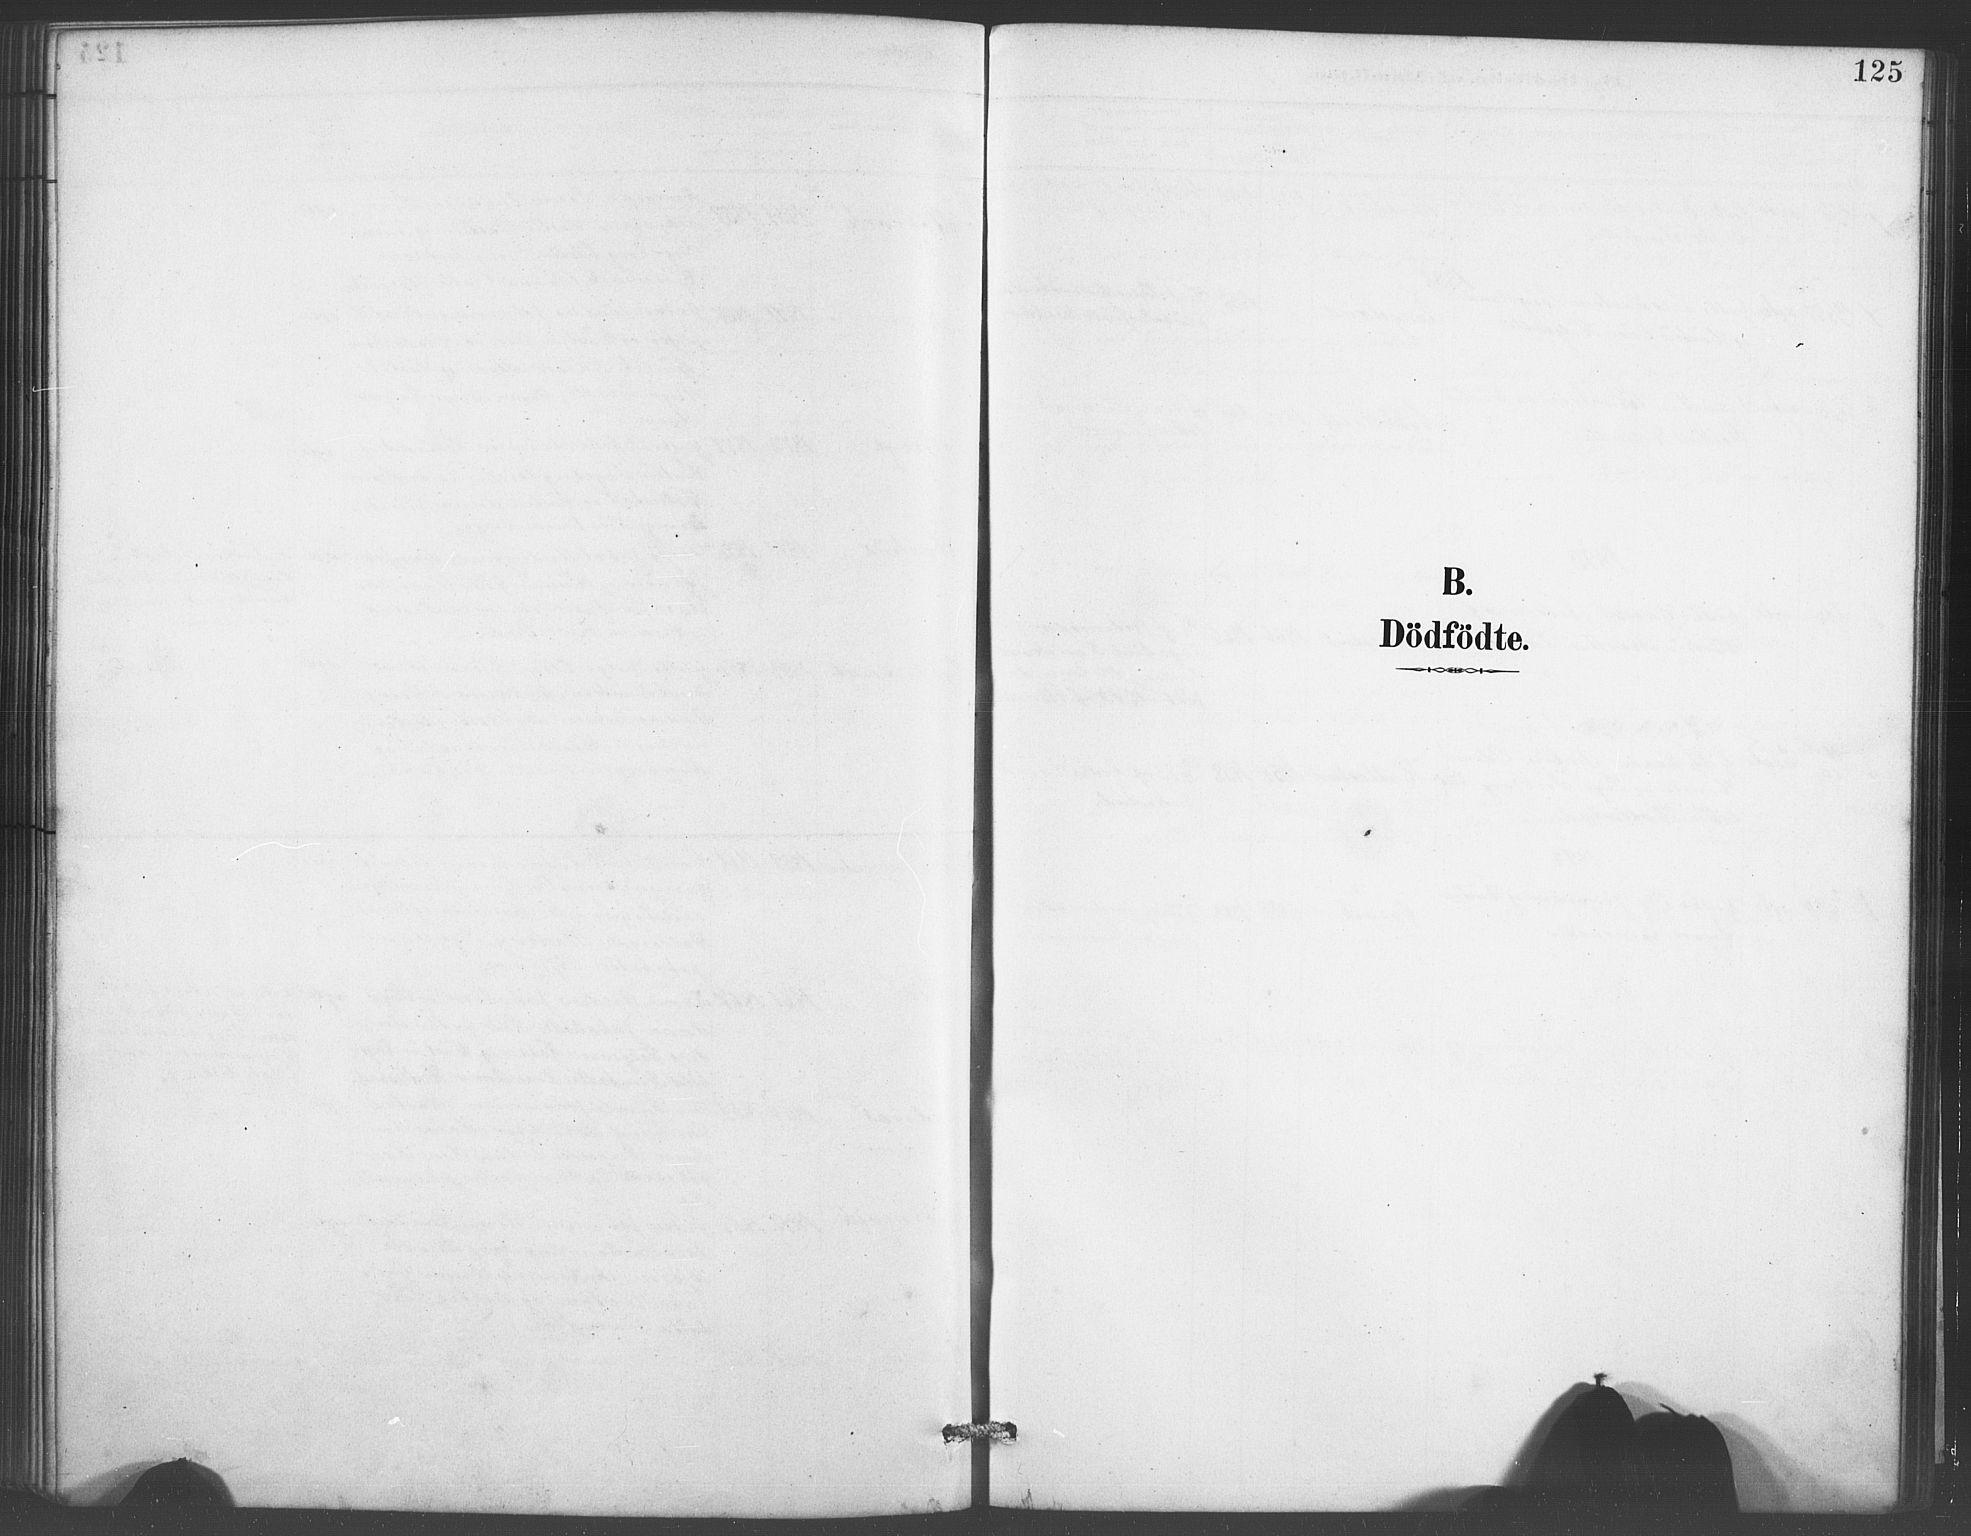 SAB, Evanger sokneprestembete*, Klokkerbok nr. A 4, 1887-1897, s. 125